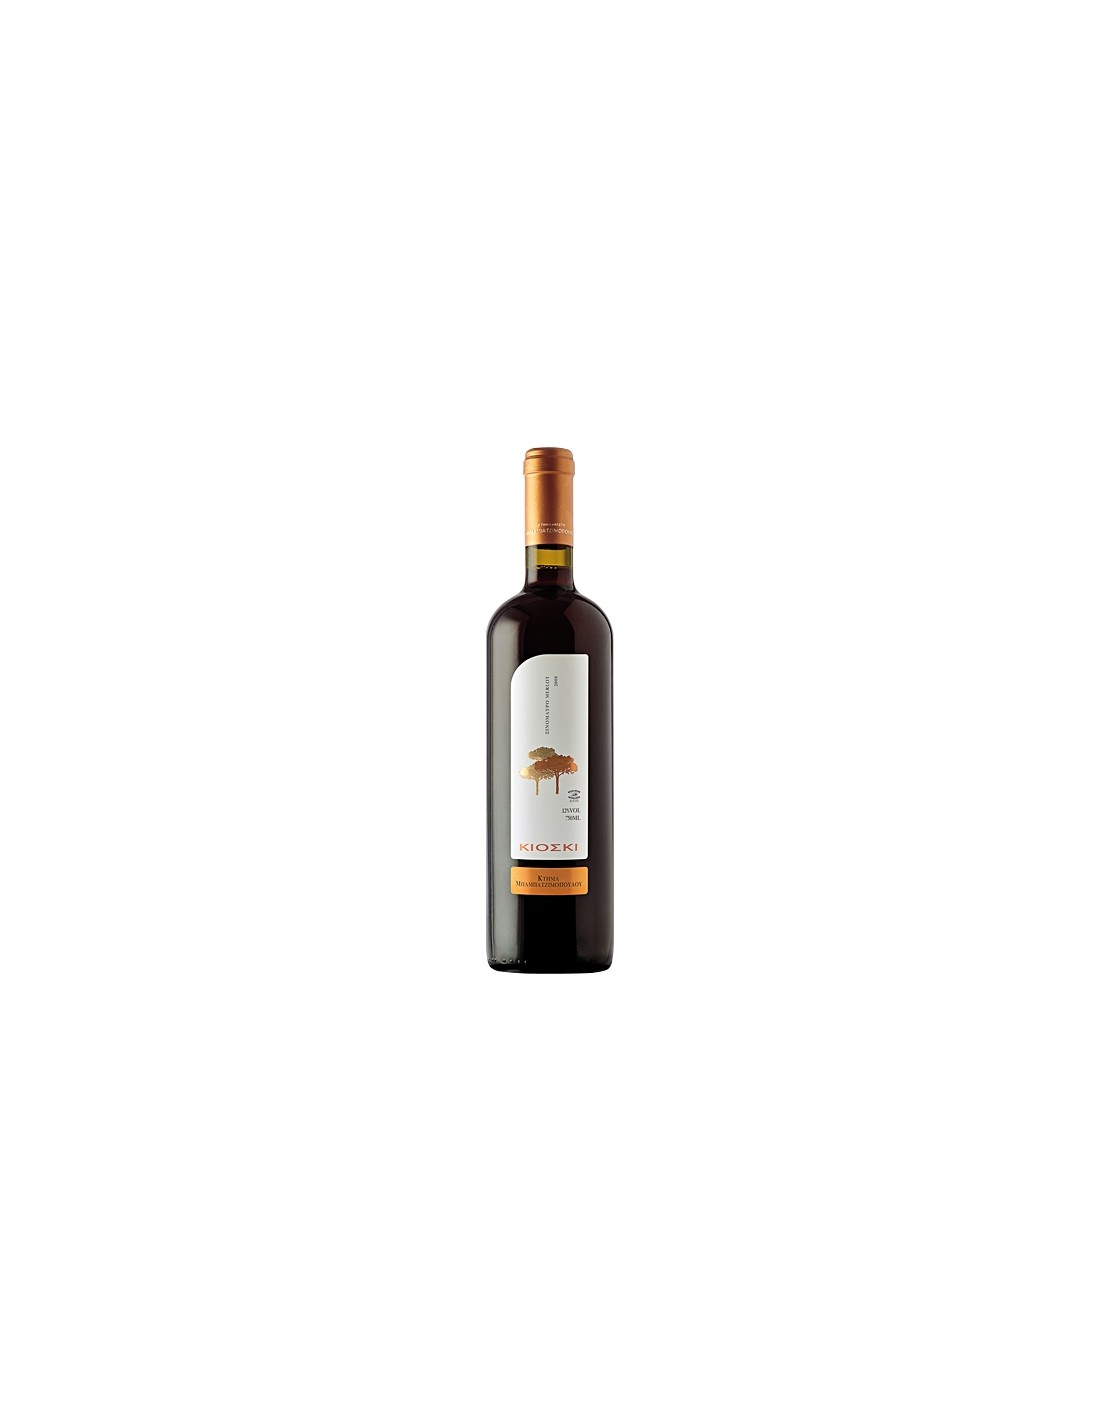 Vin rosu, Merlot, Kioski Xinom Thessalia, 0.75L, Grecia